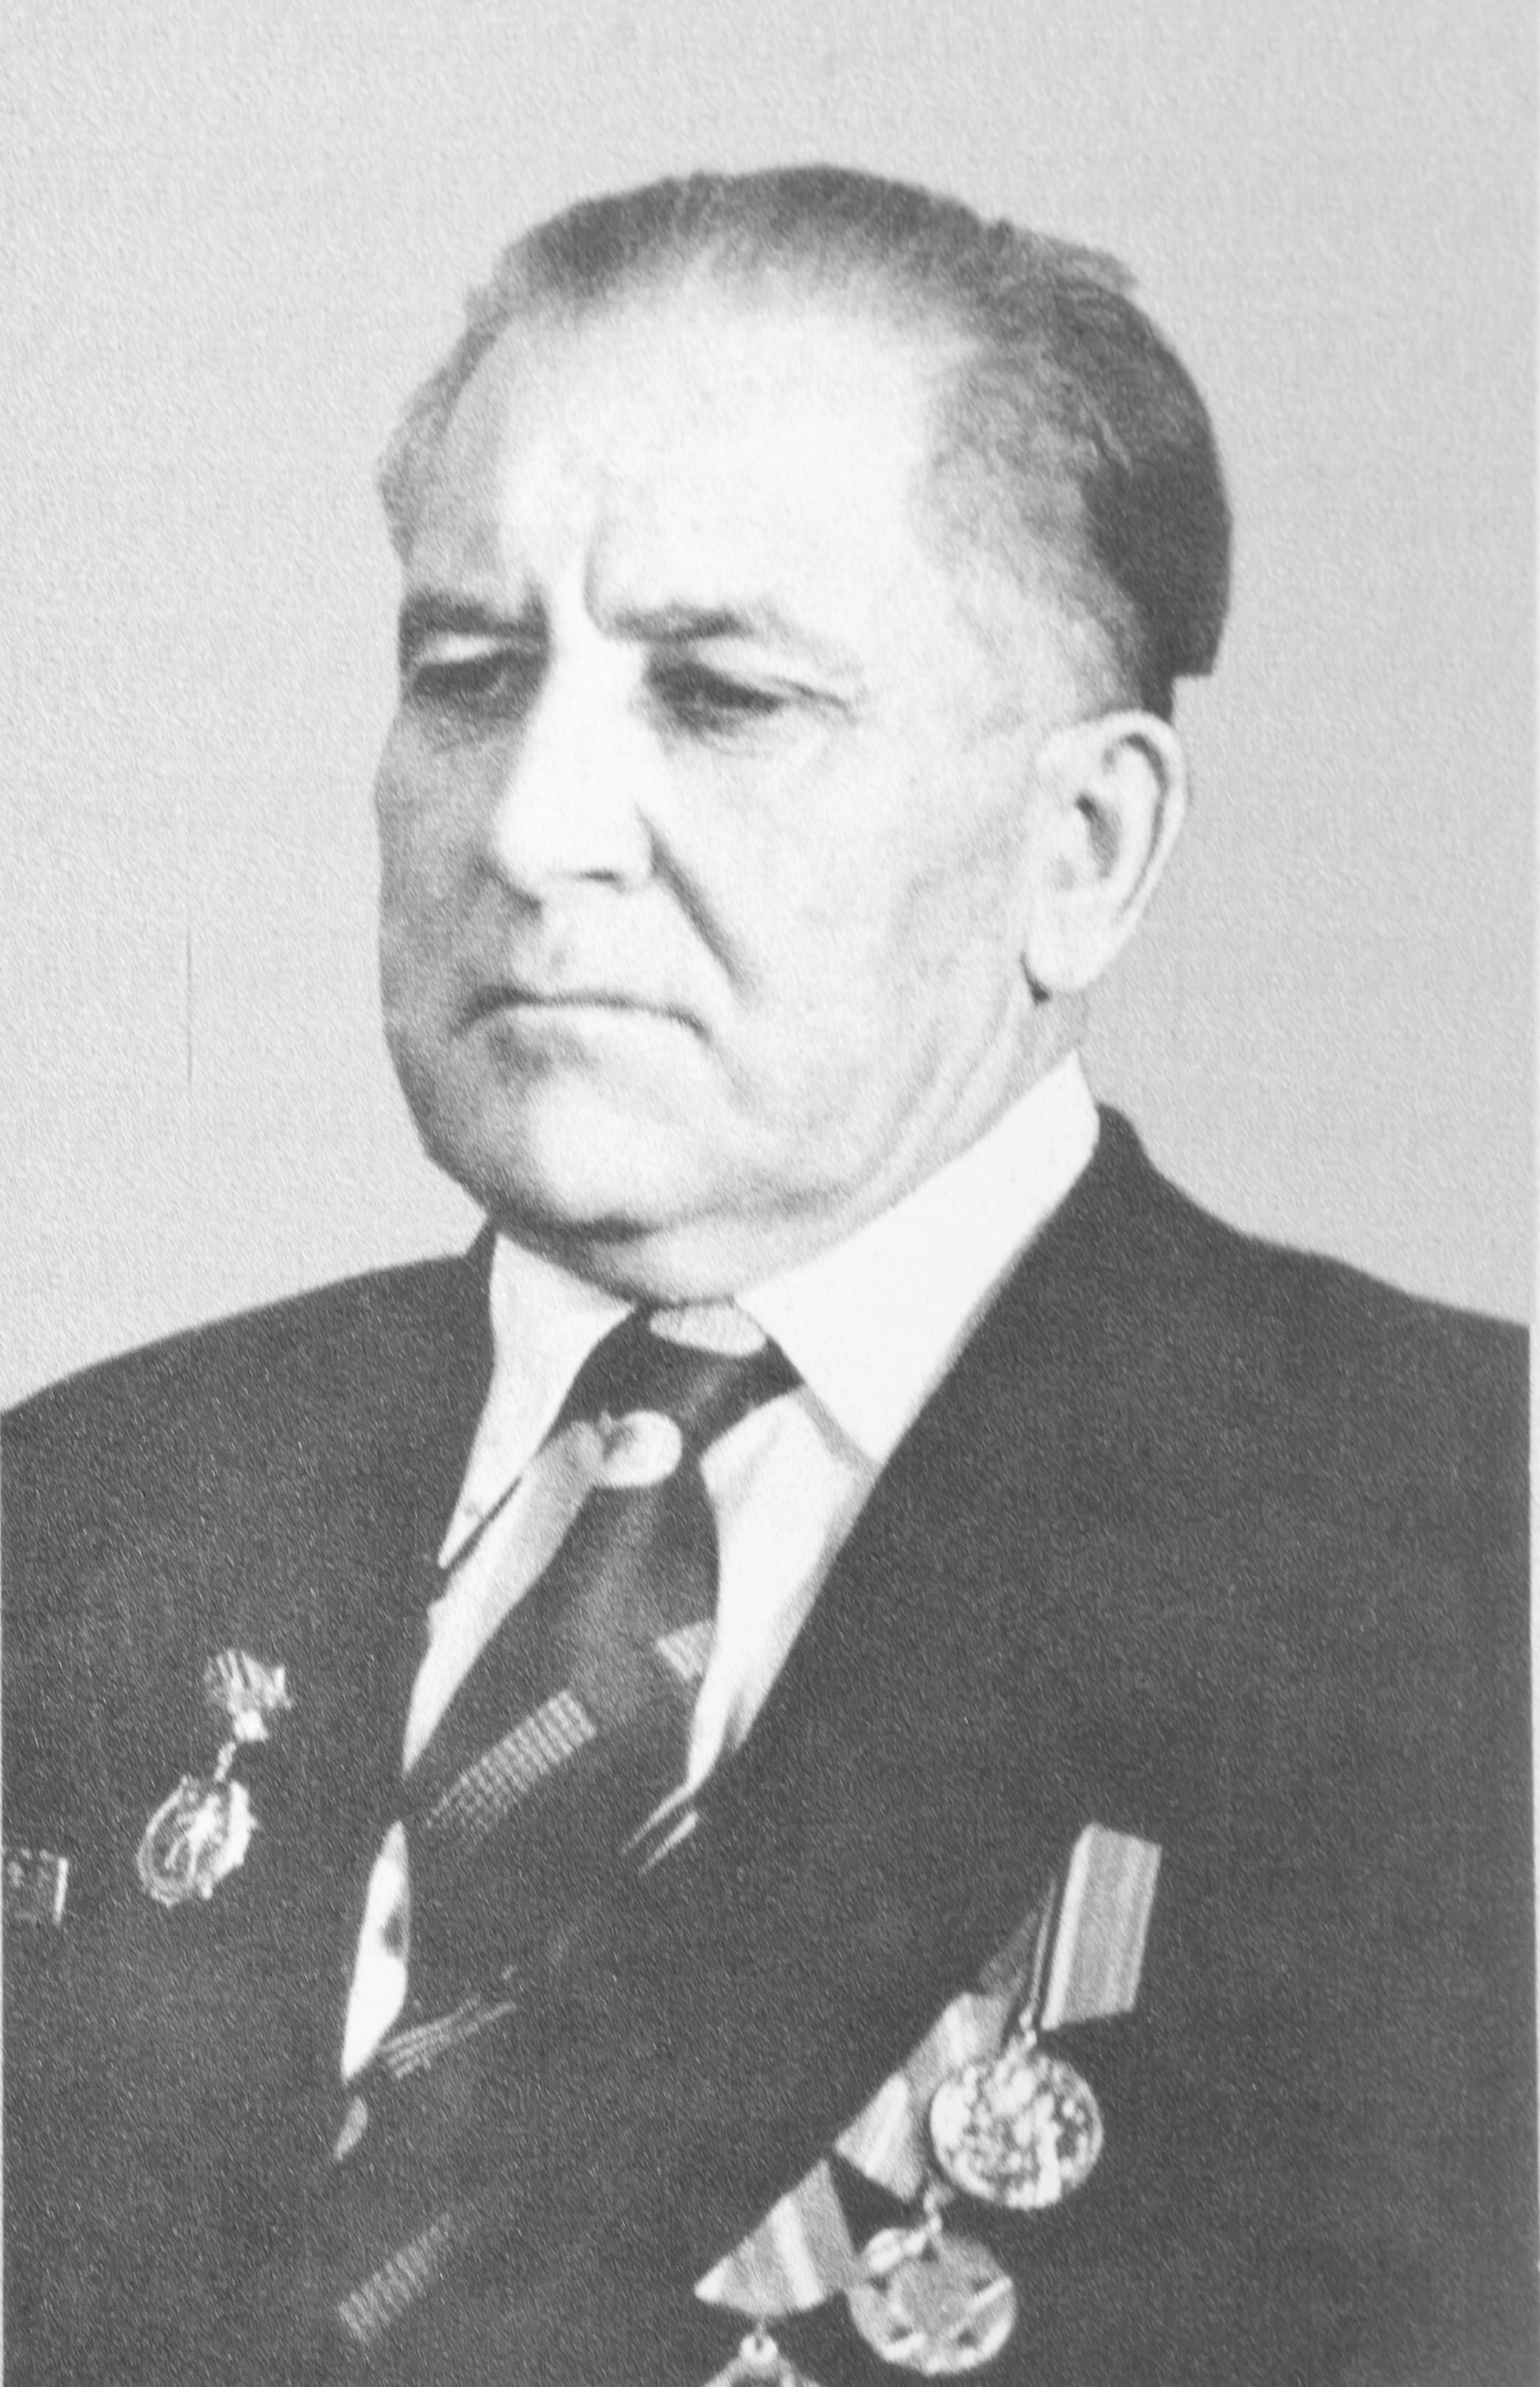 Просецкий Павел Алексеевич